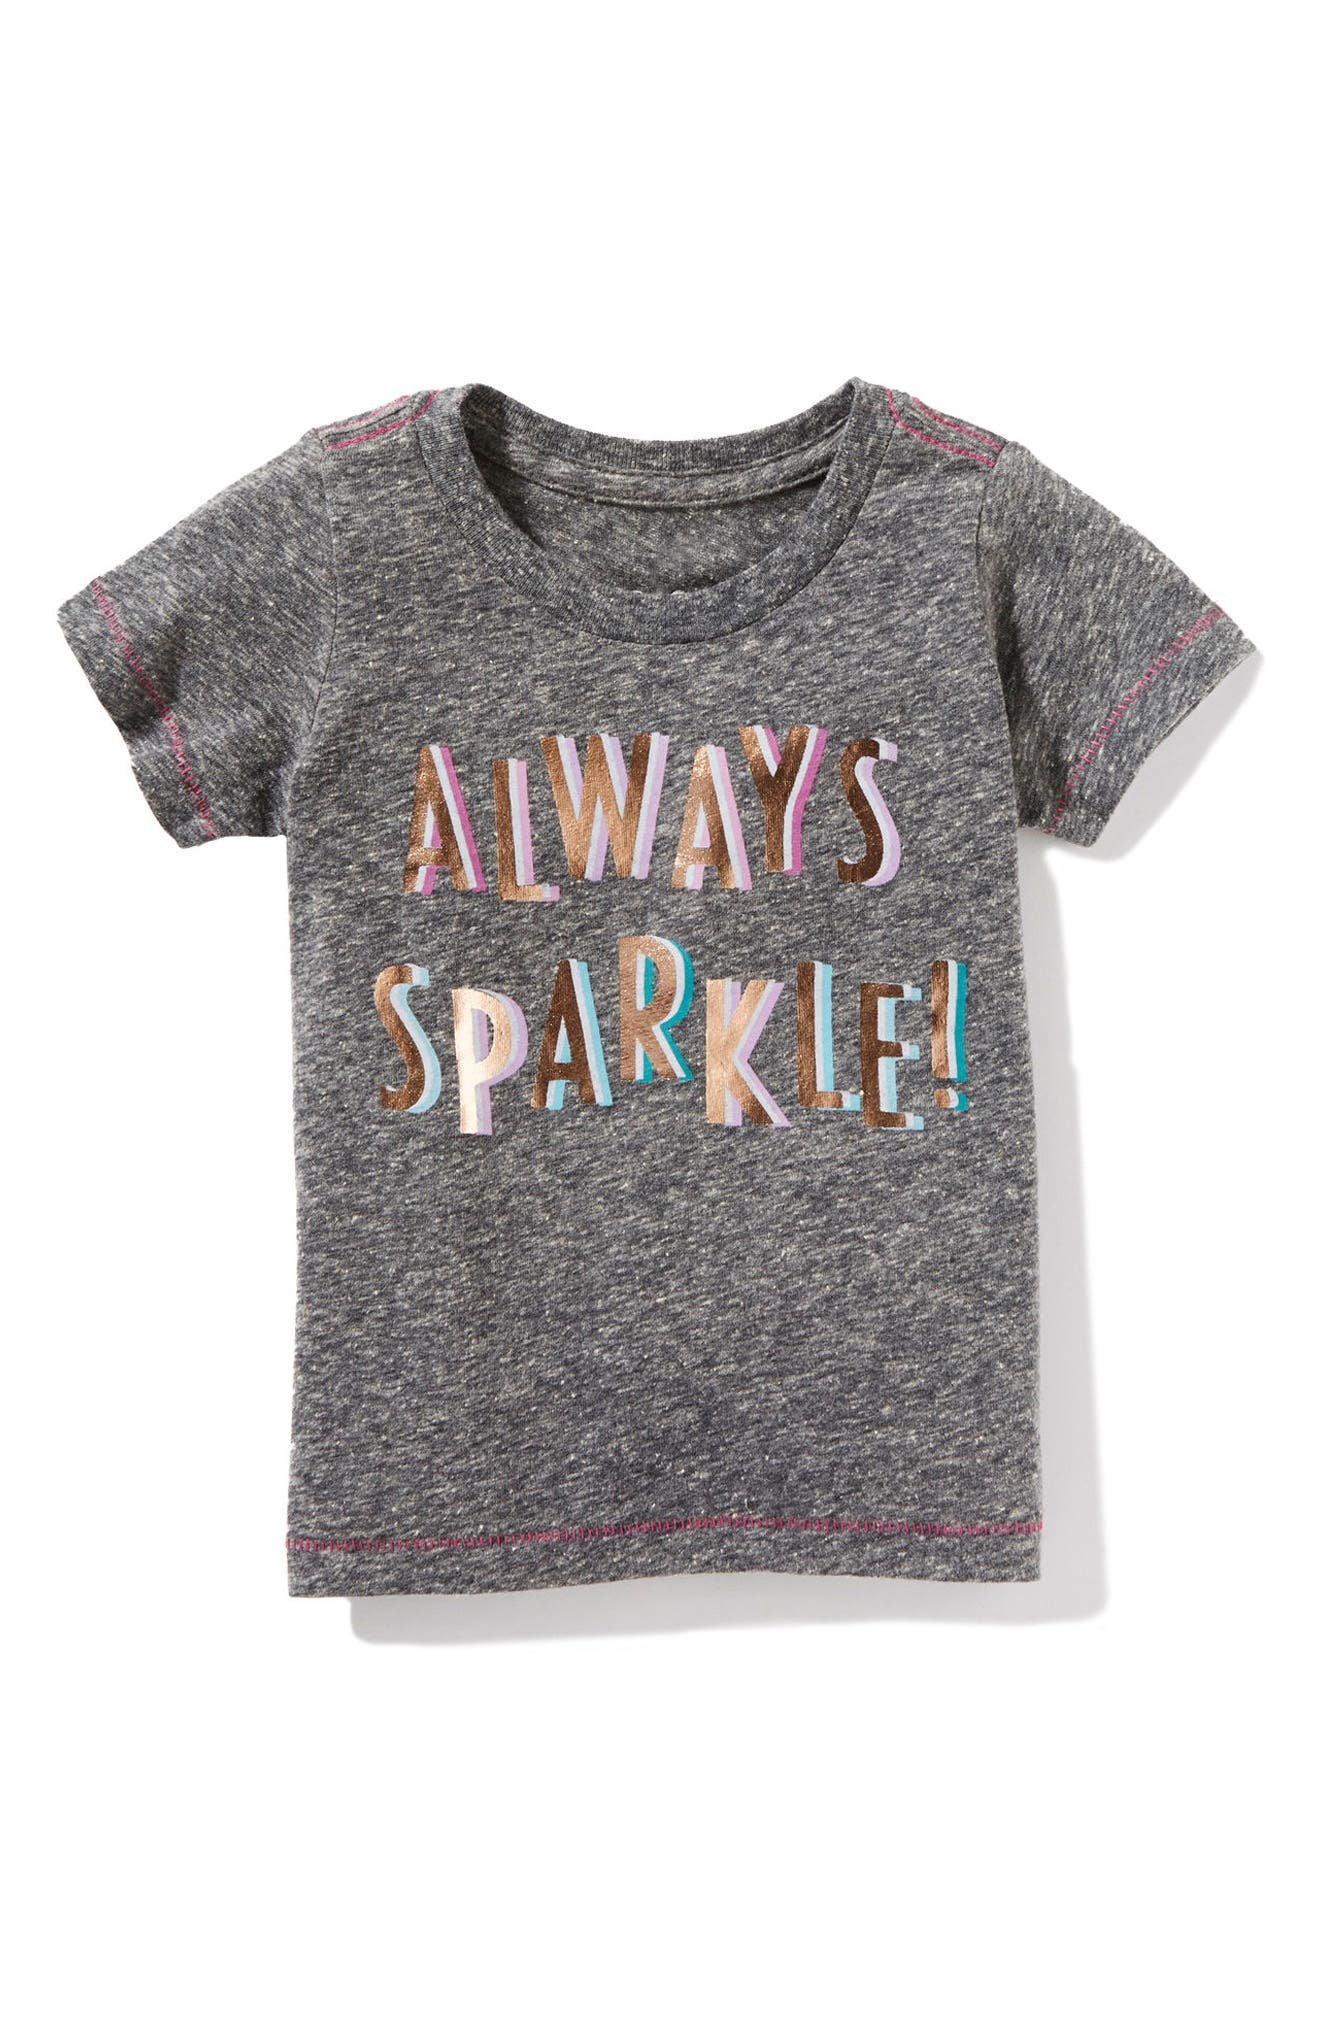 Alternate Image 1 Selected - Peek Always Sparkle Graphic Tee (Baby Girls)